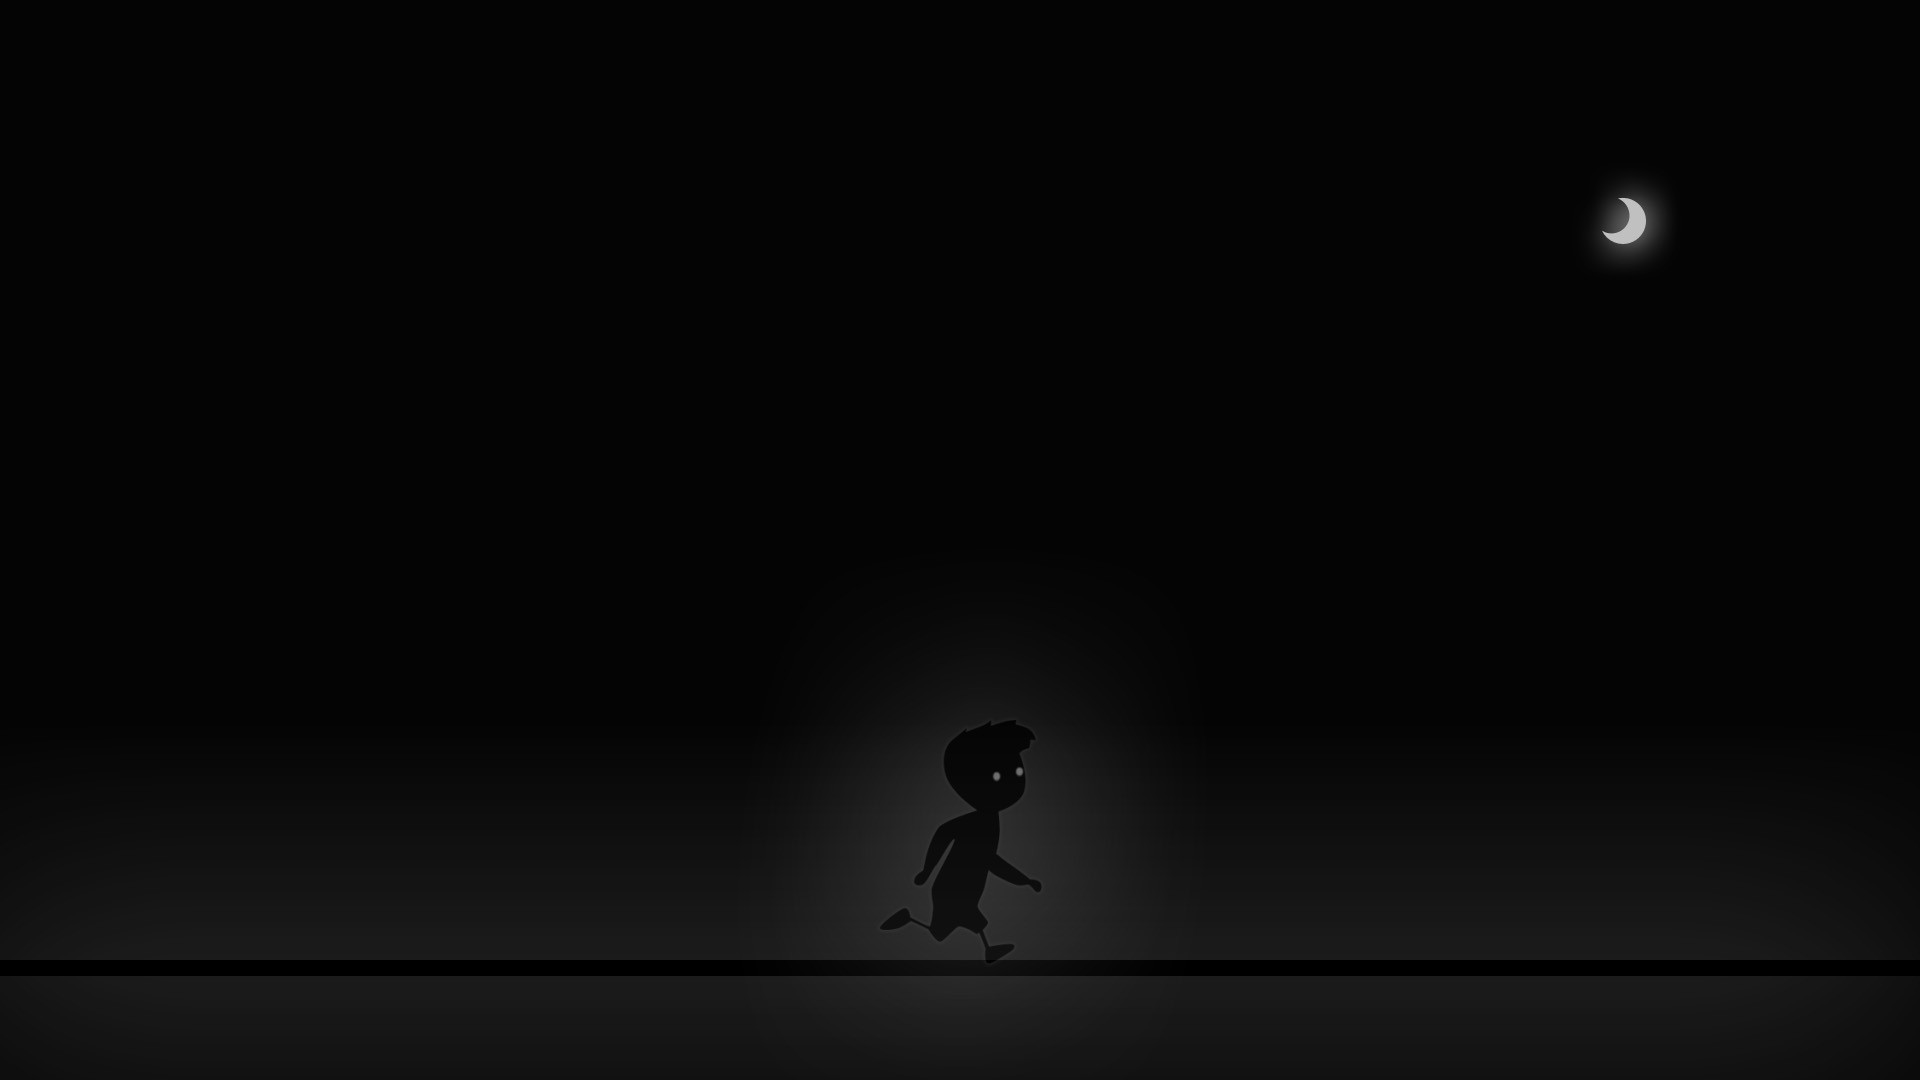 Wallpaper Limbo video game